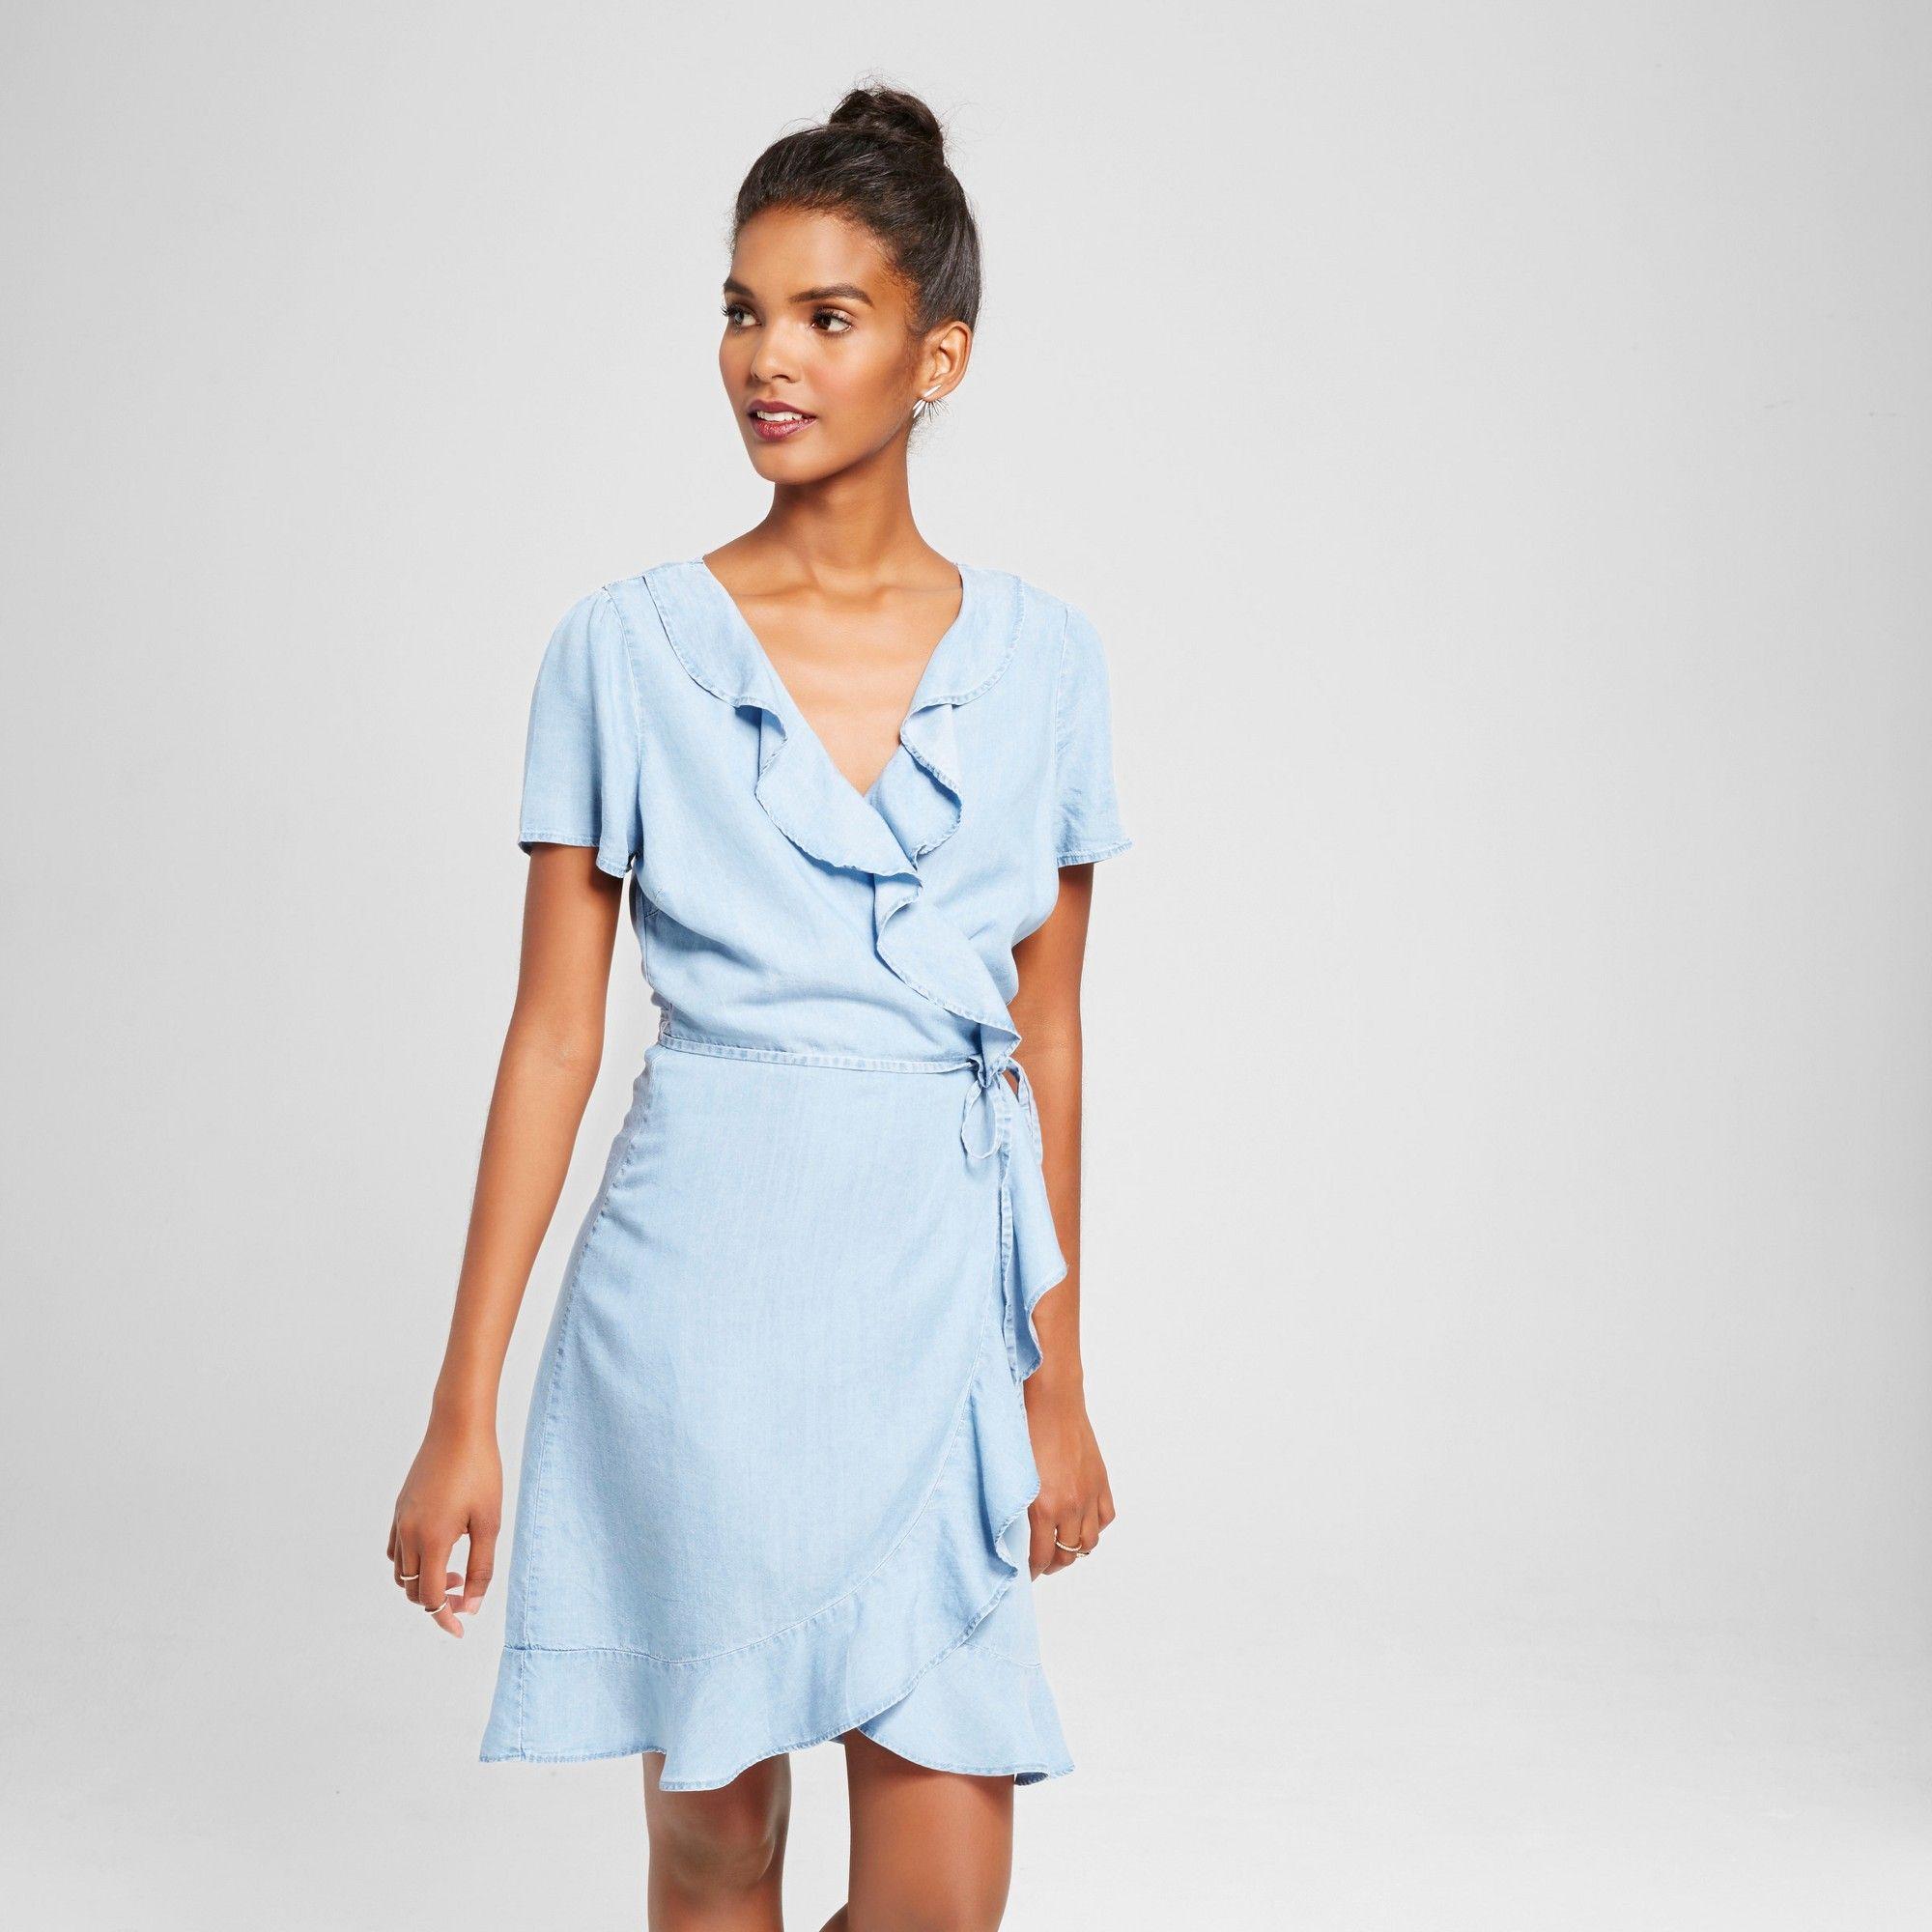 Women s Chambray Ruffle Wrap Dress Light Blue M - 3Hearts (Juniors ... da0c34d4f